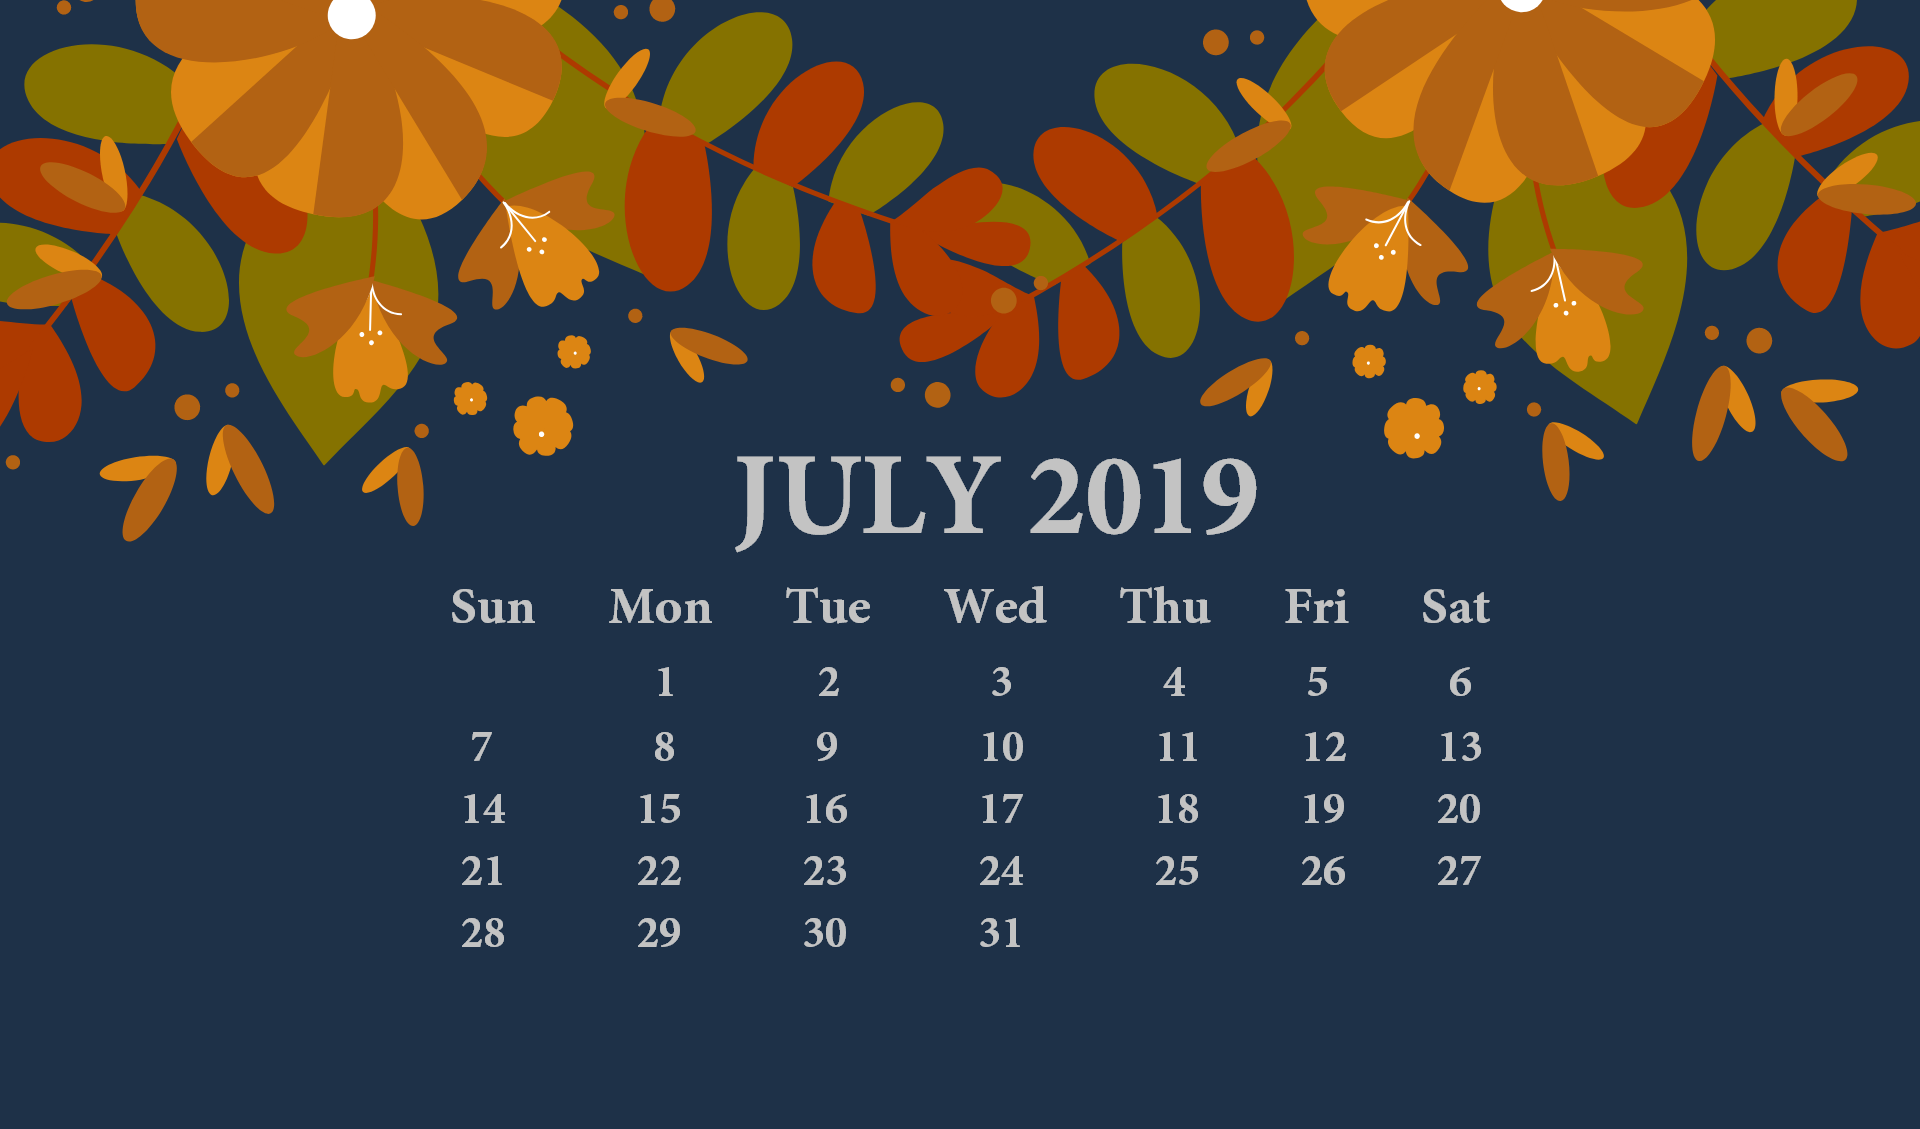 July 2019 Desktop Wallpaper With Calendar